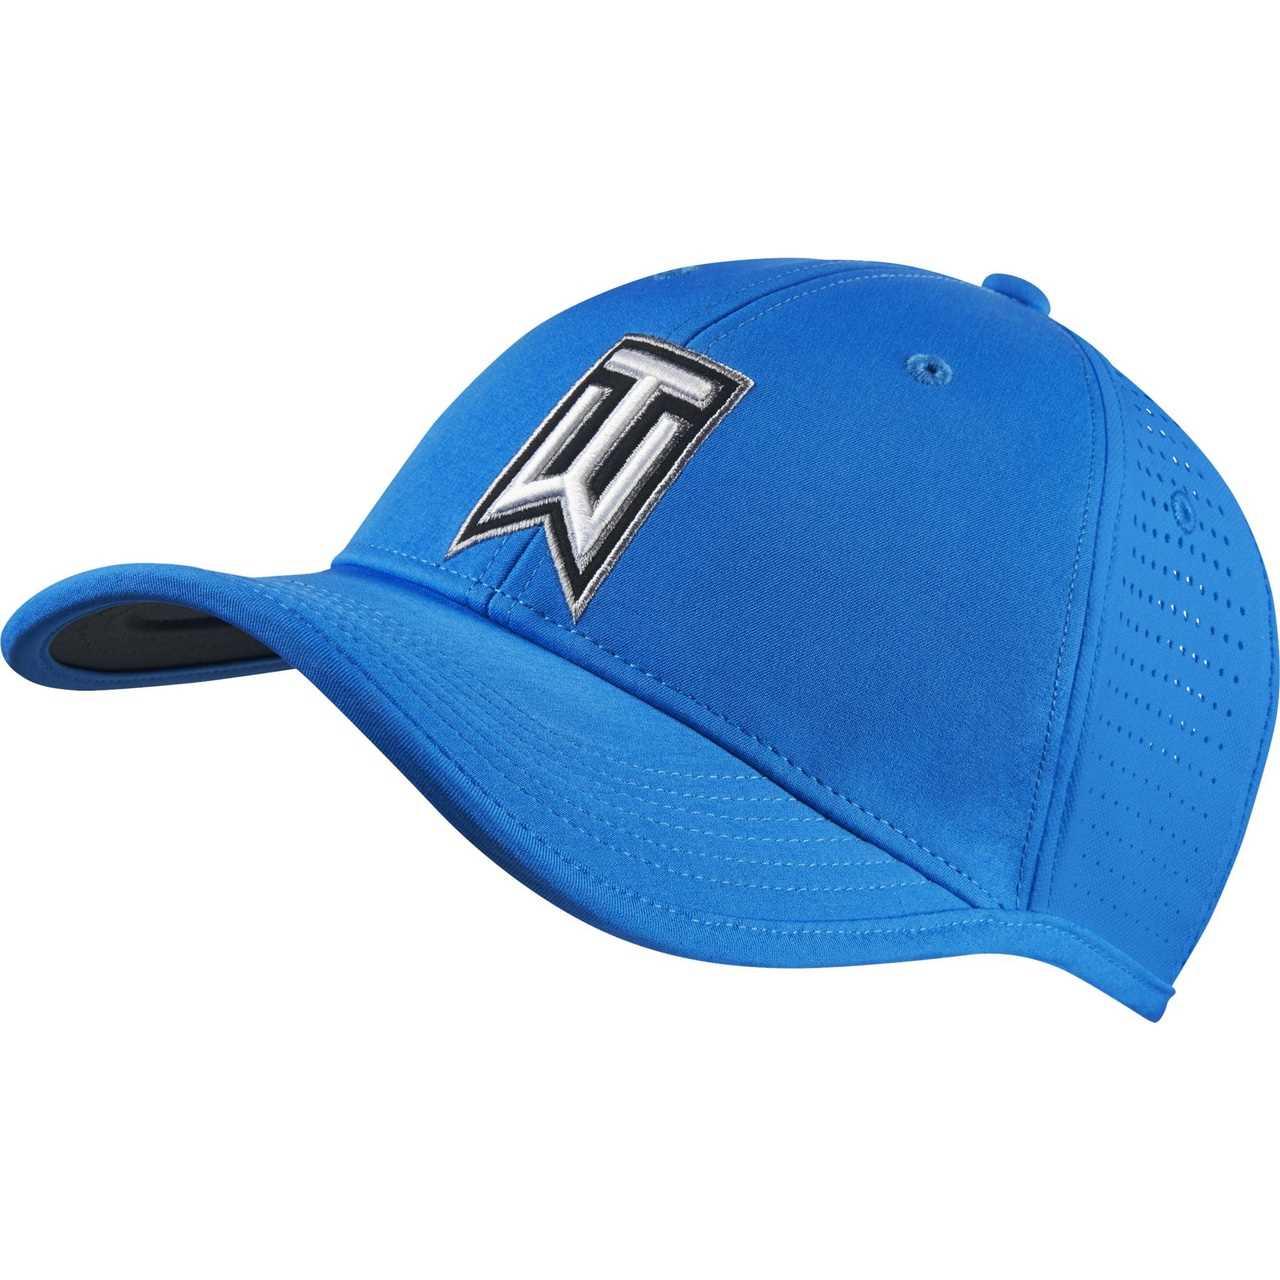 536cc94b Nike Golf TW Ultralight Tour Adjustable Hat (Ocean Fog/Black ...